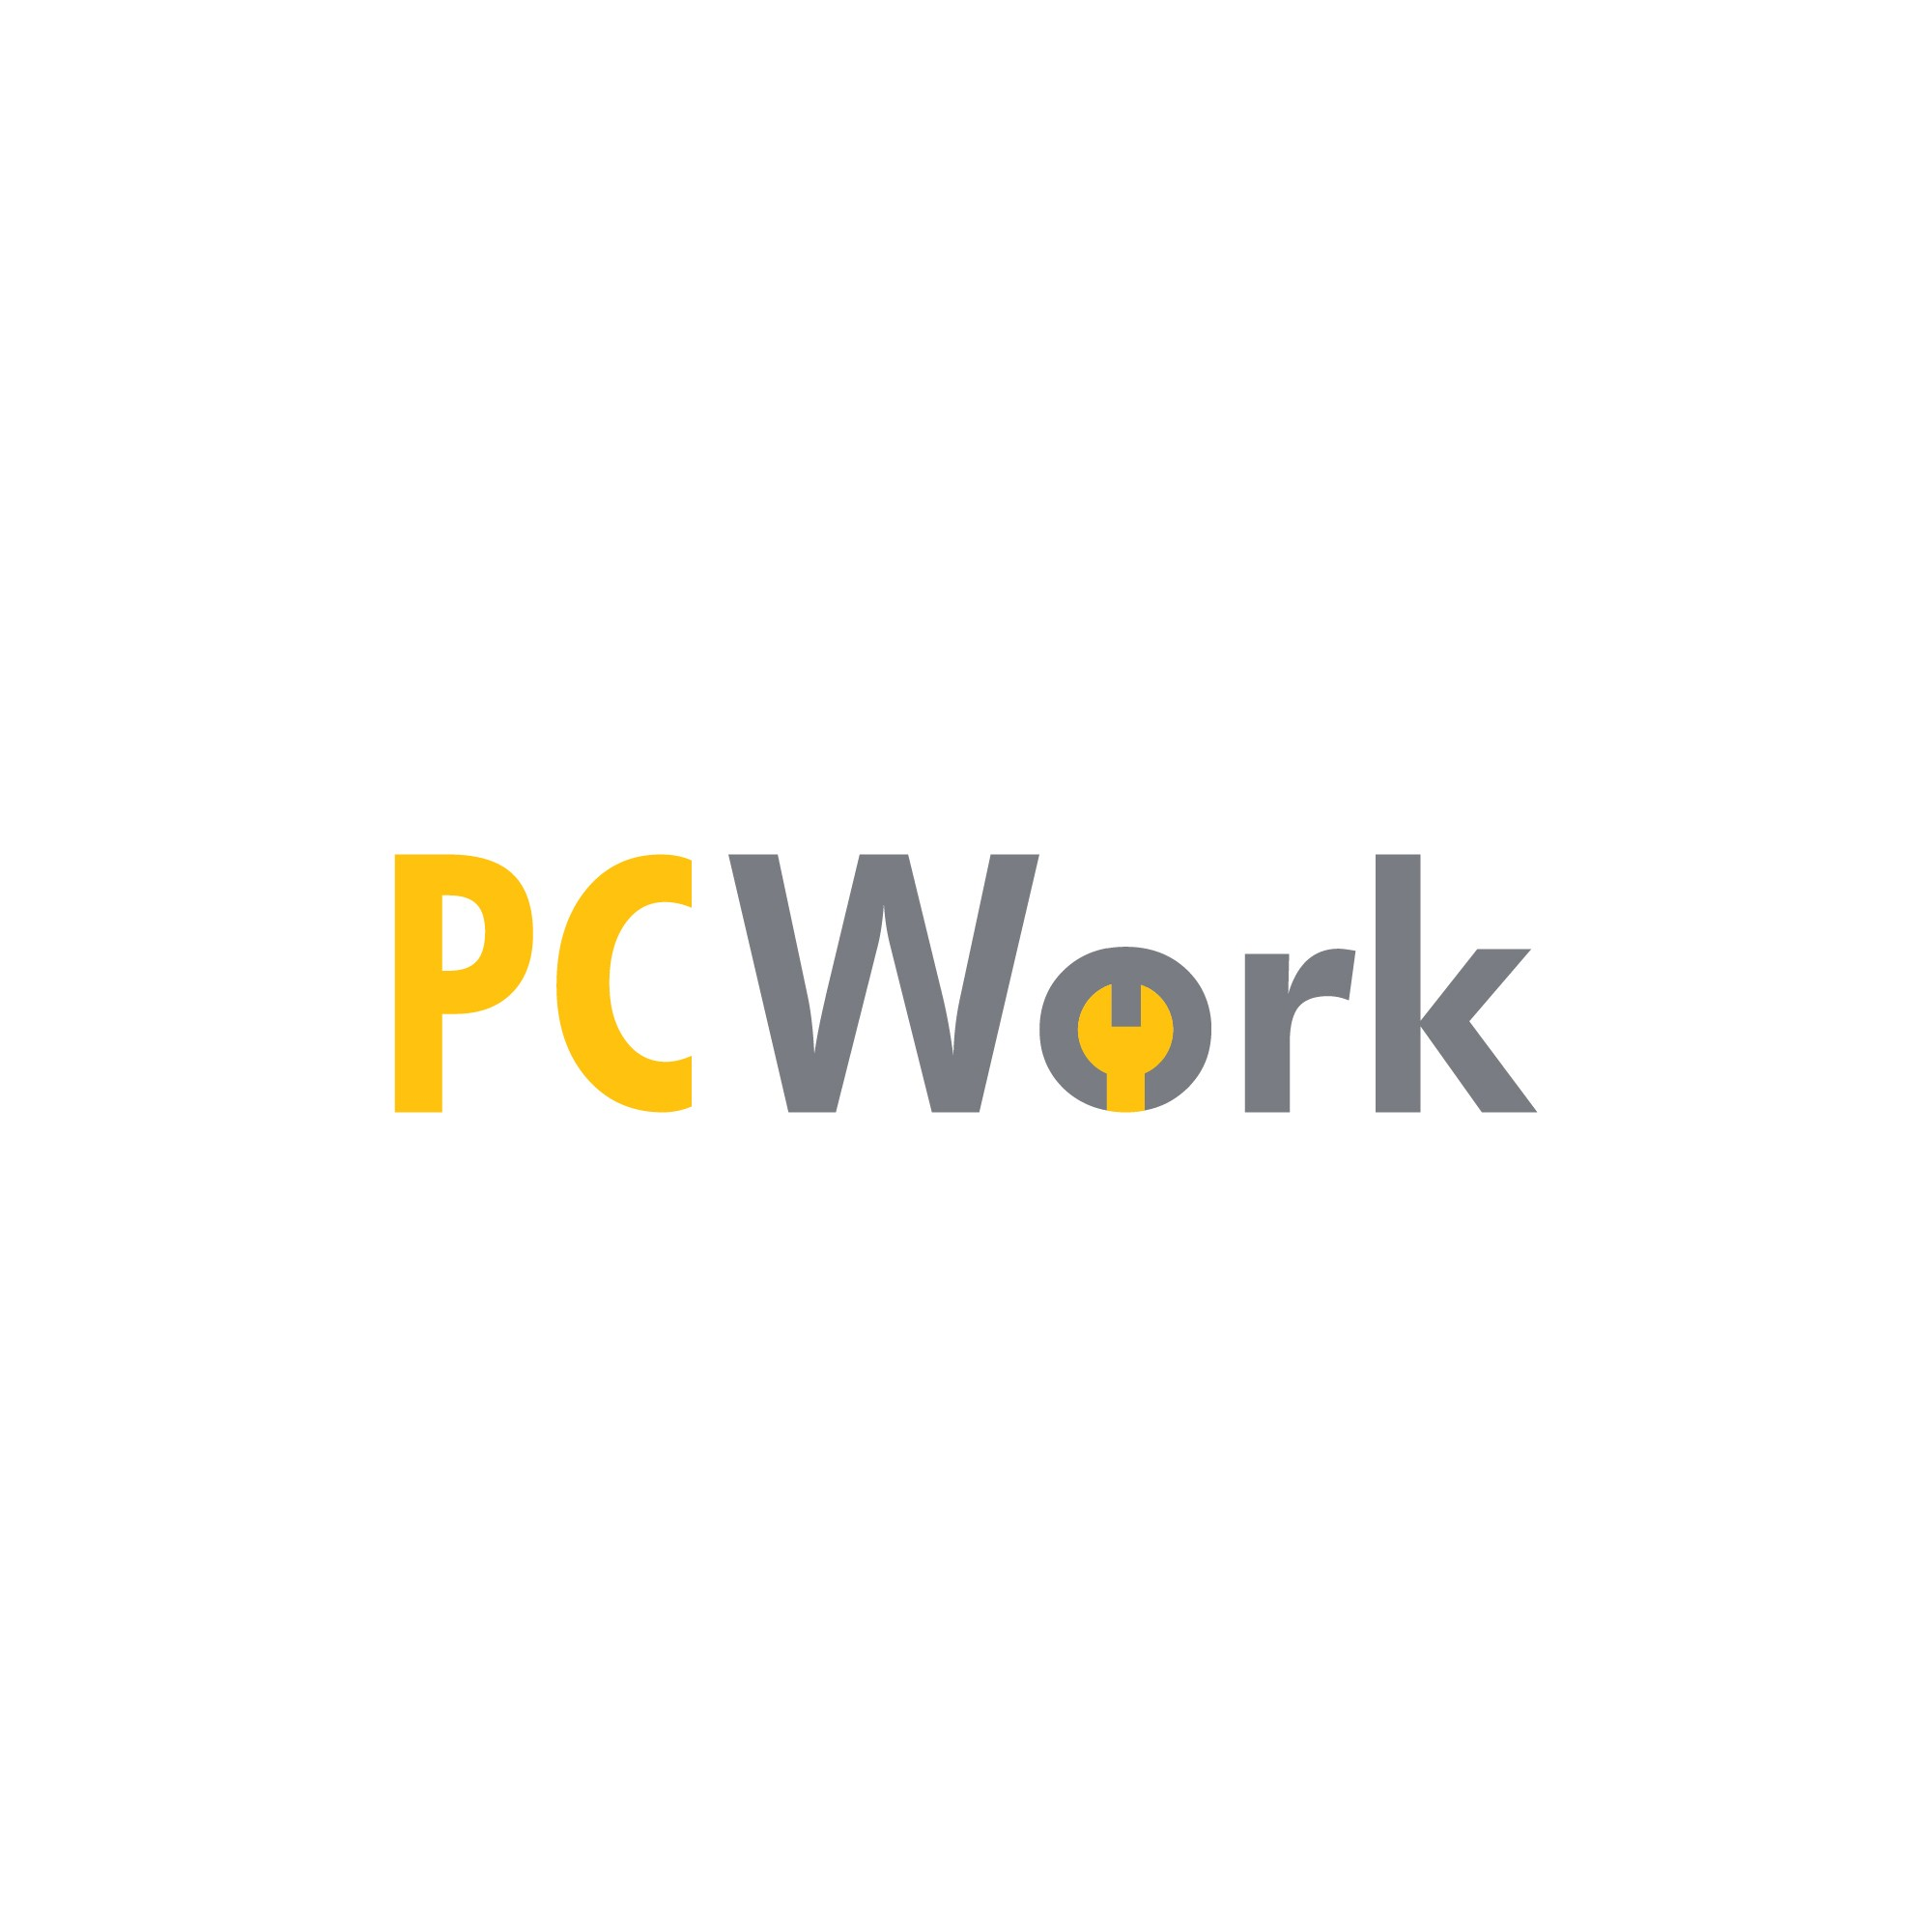 PCWORK